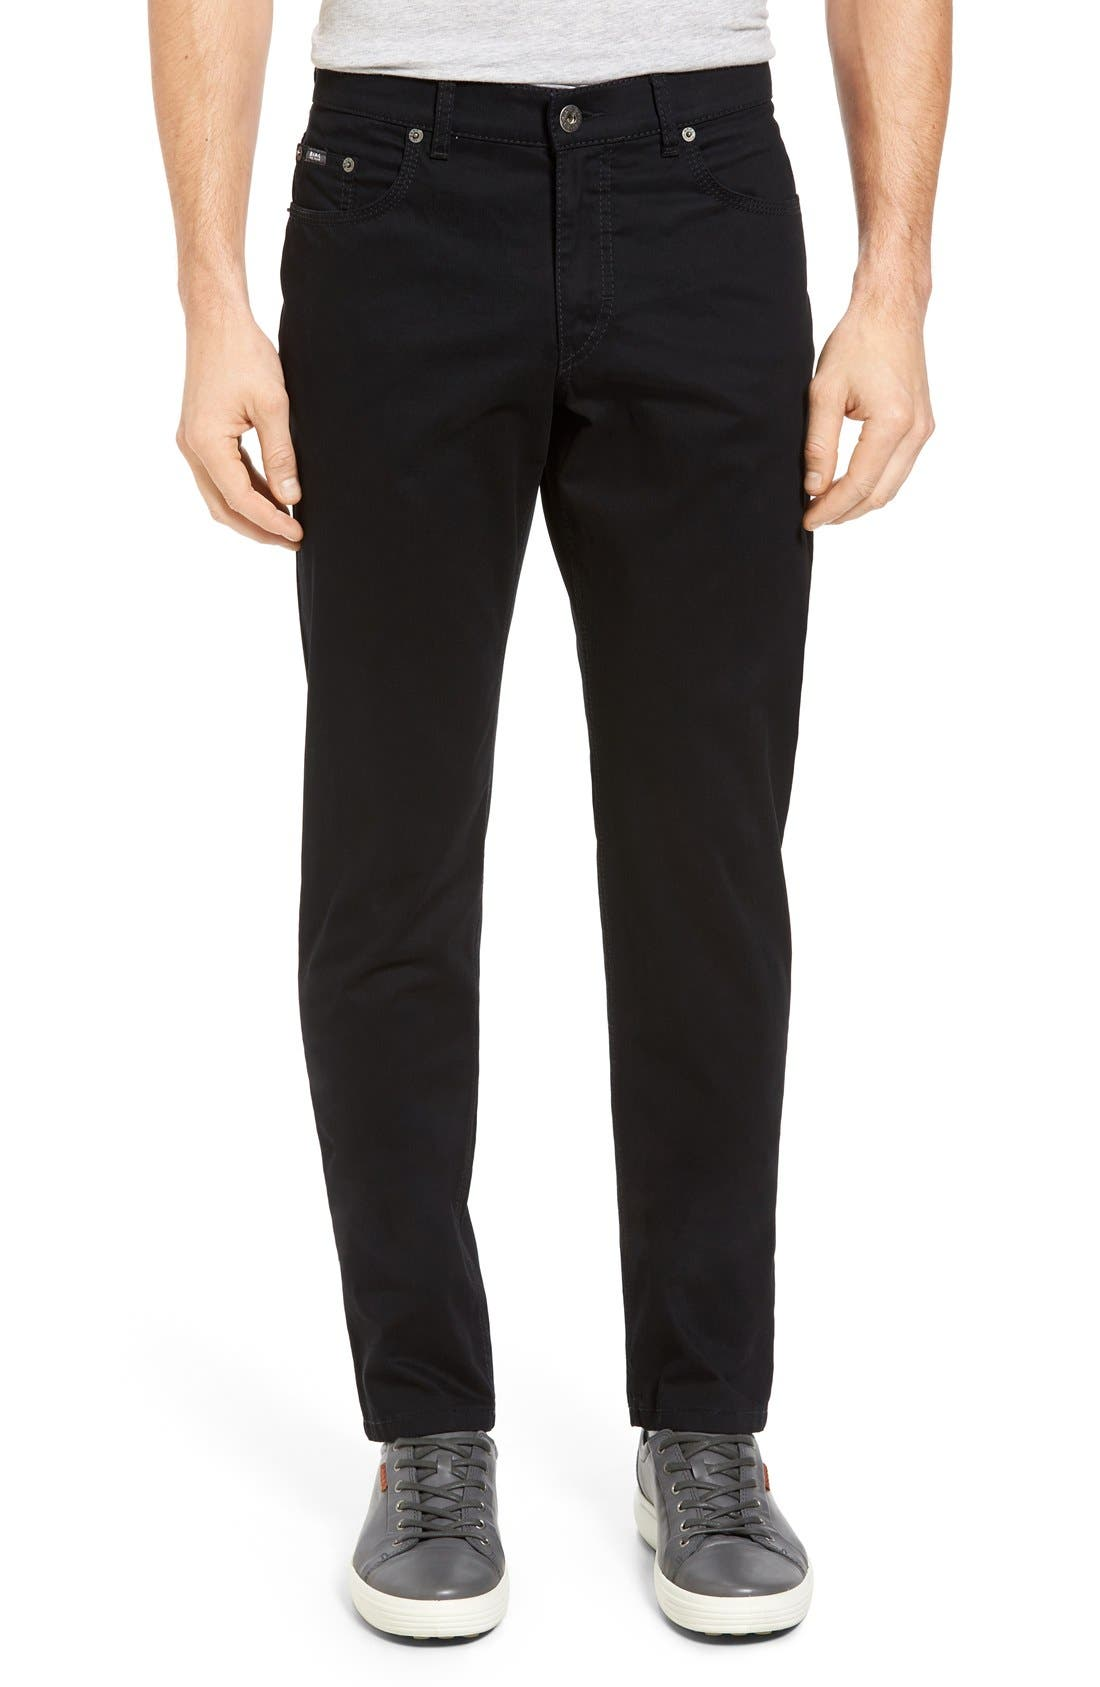 Cooper Prestige Stretch Cotton Pants,                             Main thumbnail 1, color,                             PERMA BLACK